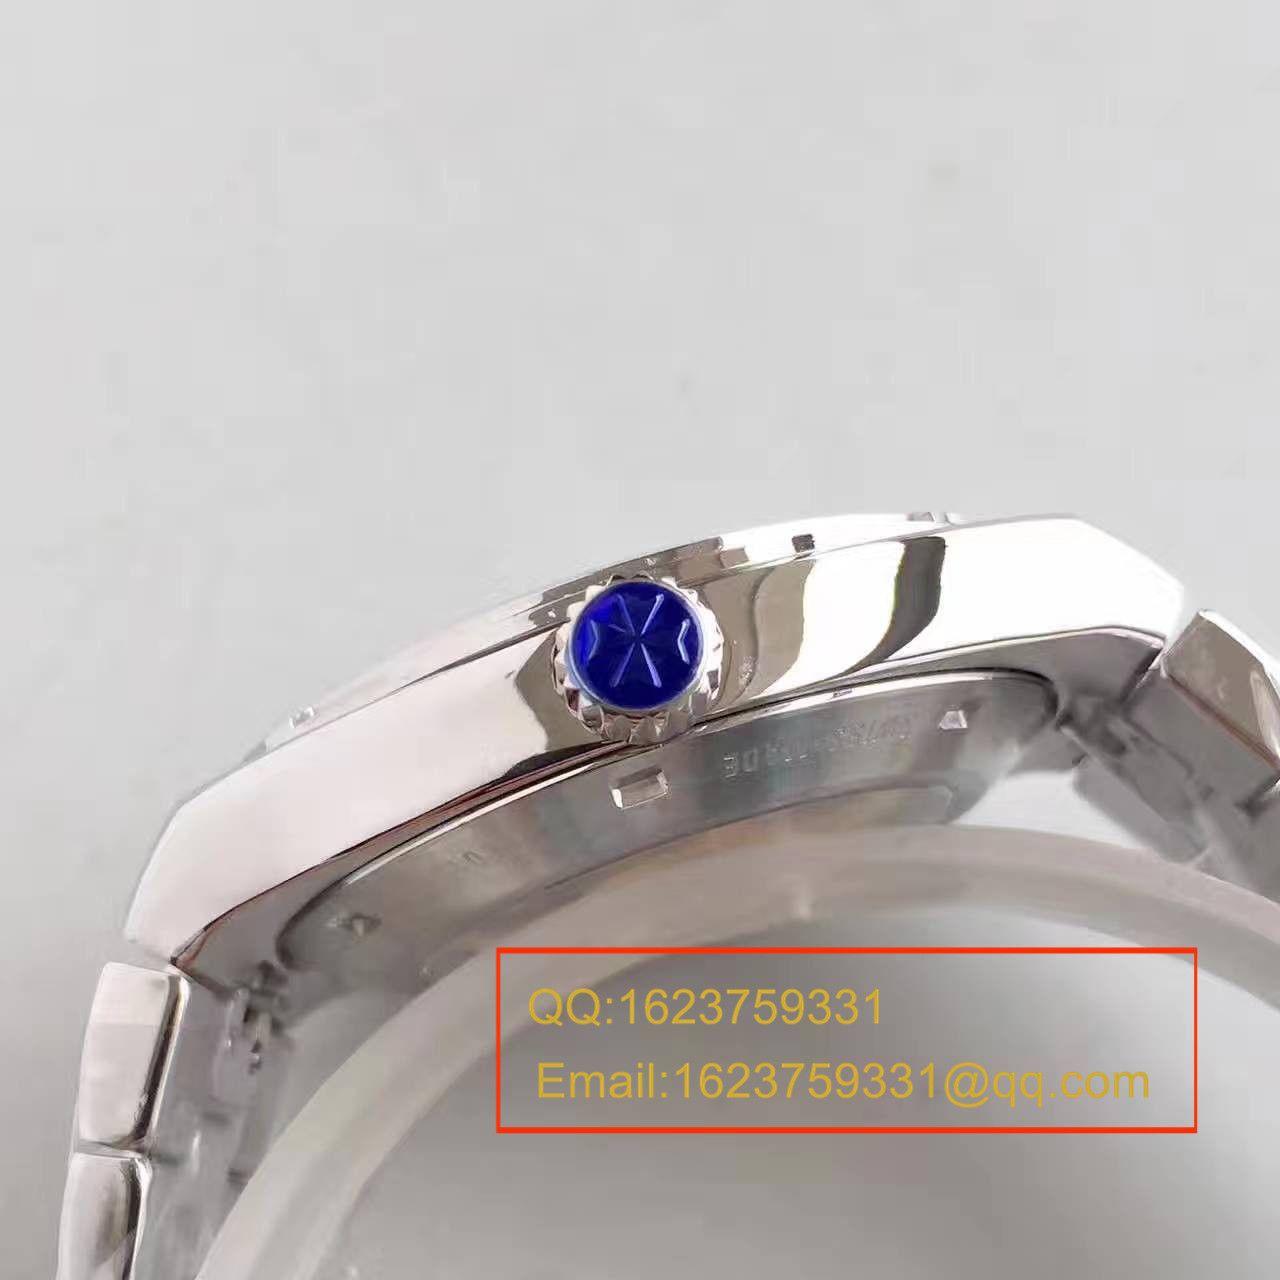 【8F厂一比一复刻手表】江诗丹顿纵横四海系列4500V/110A-B146腕表 / JS182